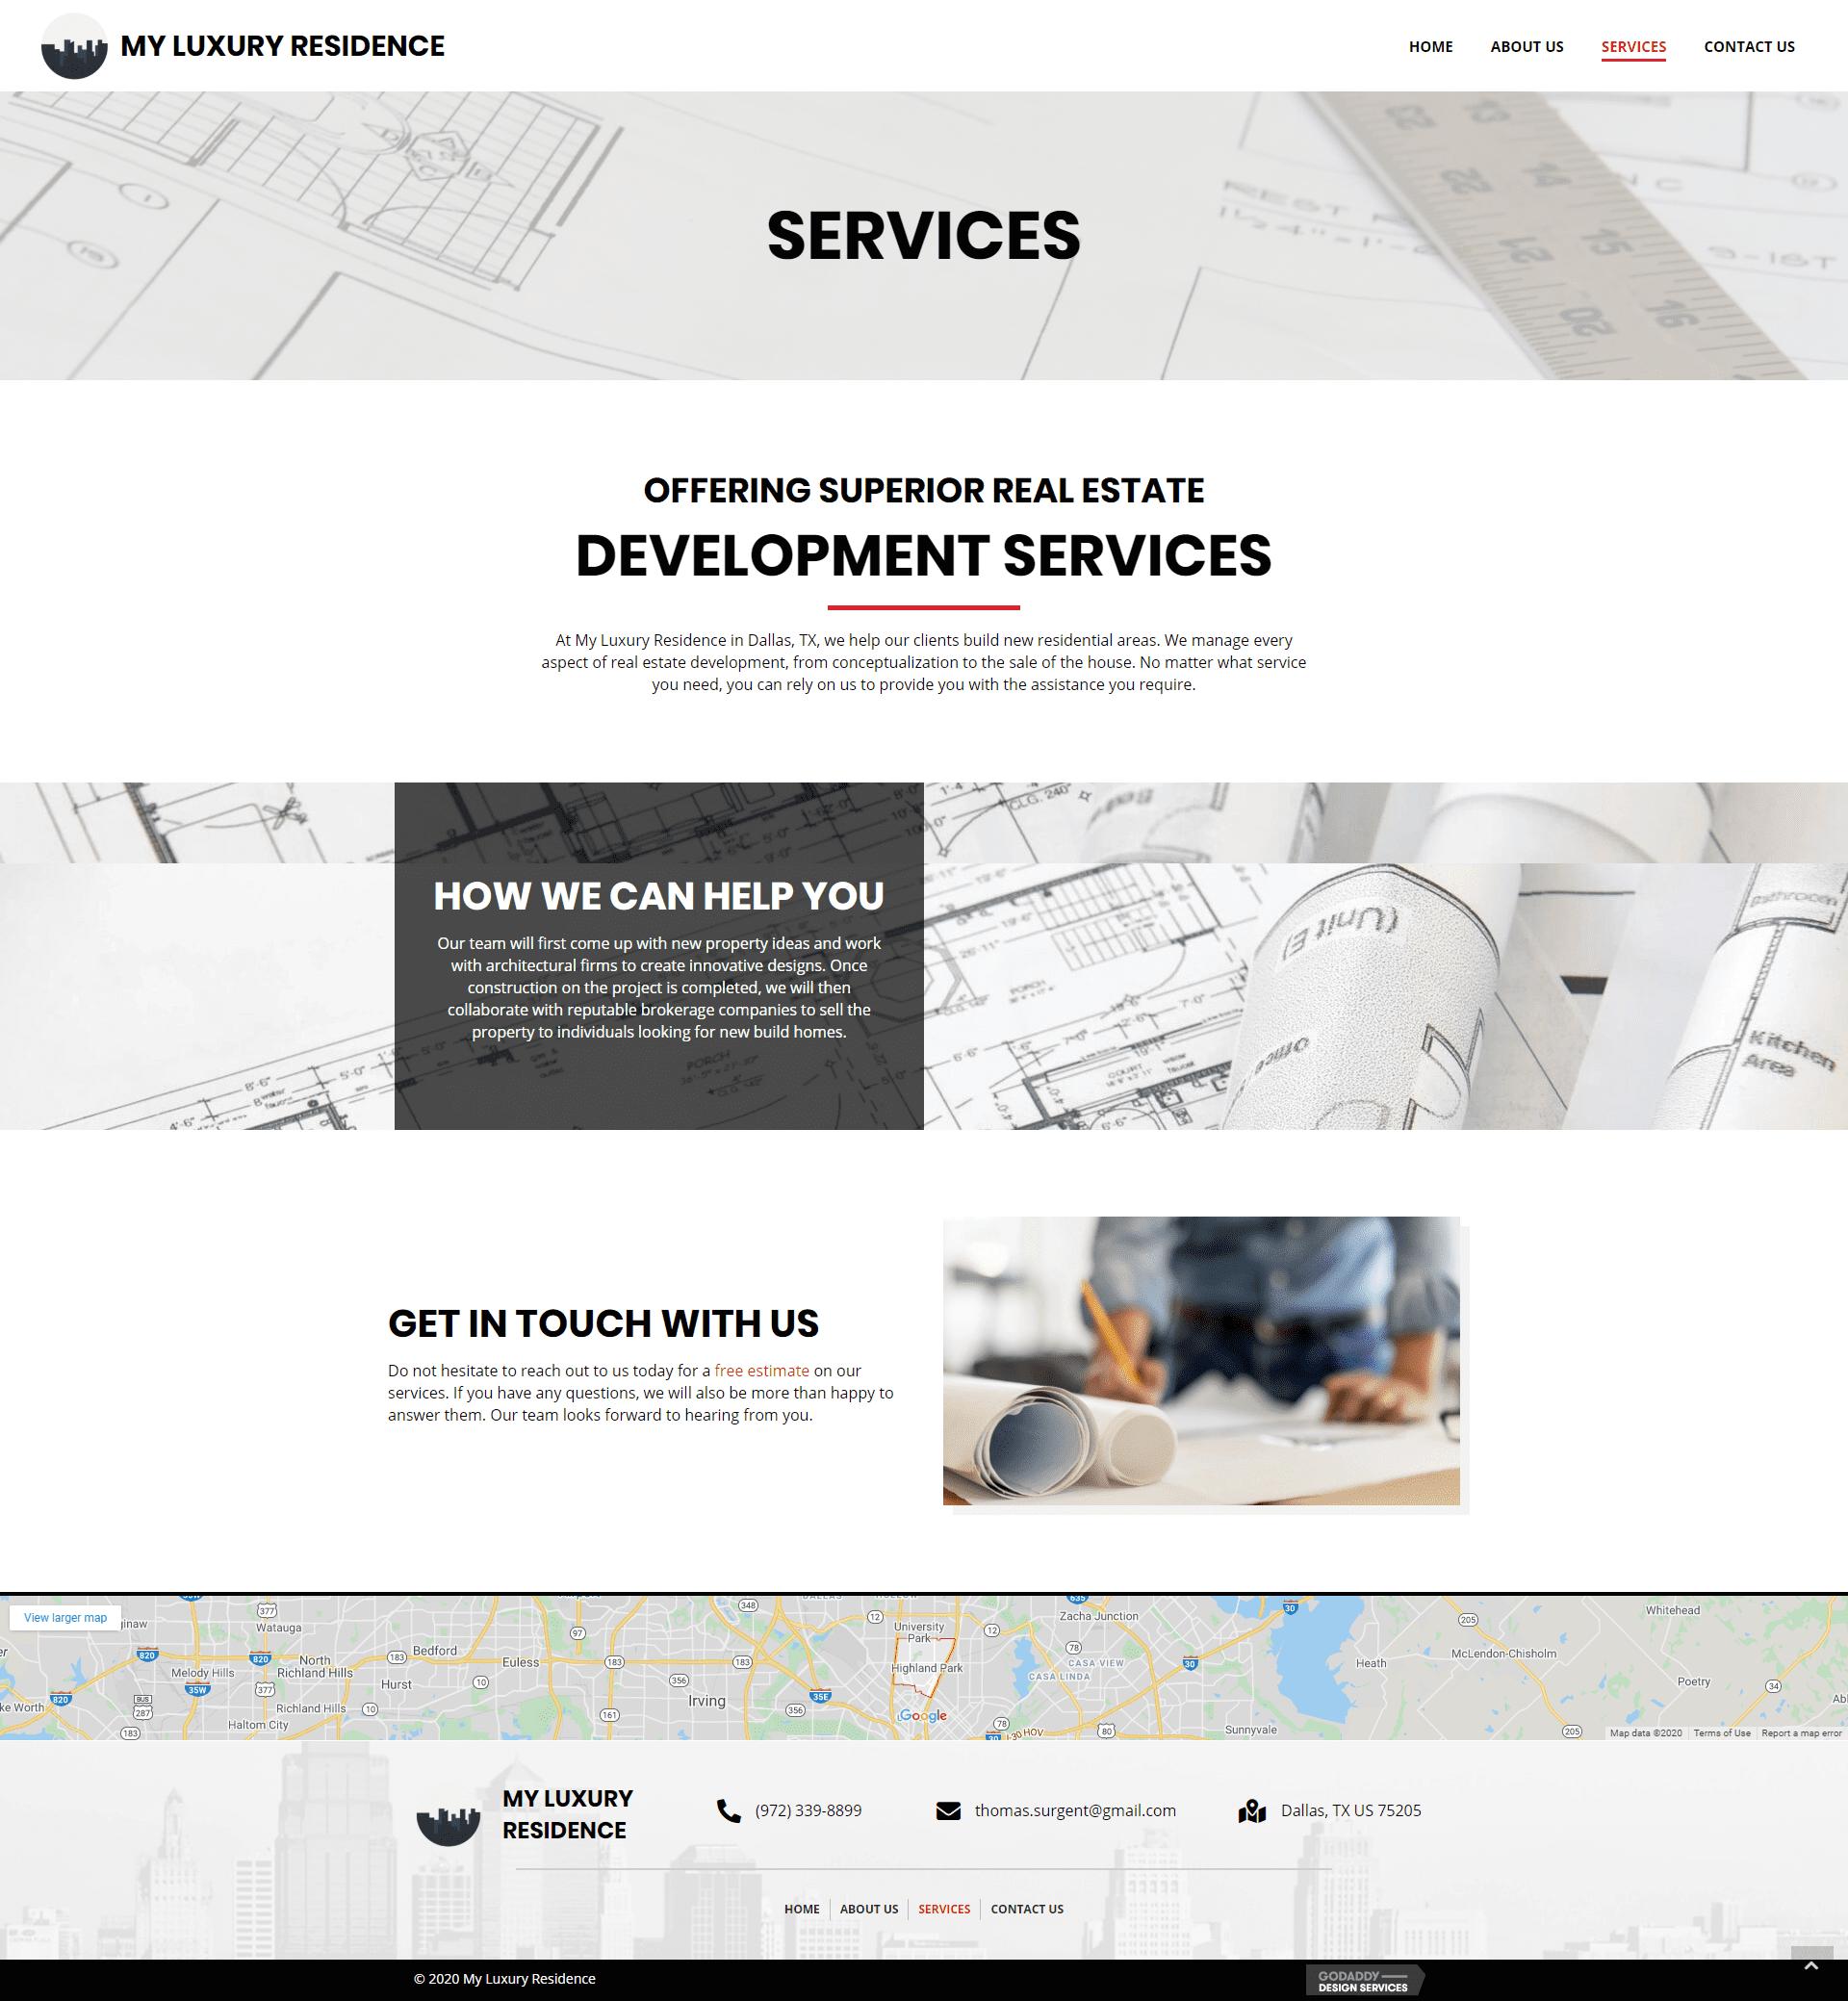 screencapture-0b0-170-myftpupload-services